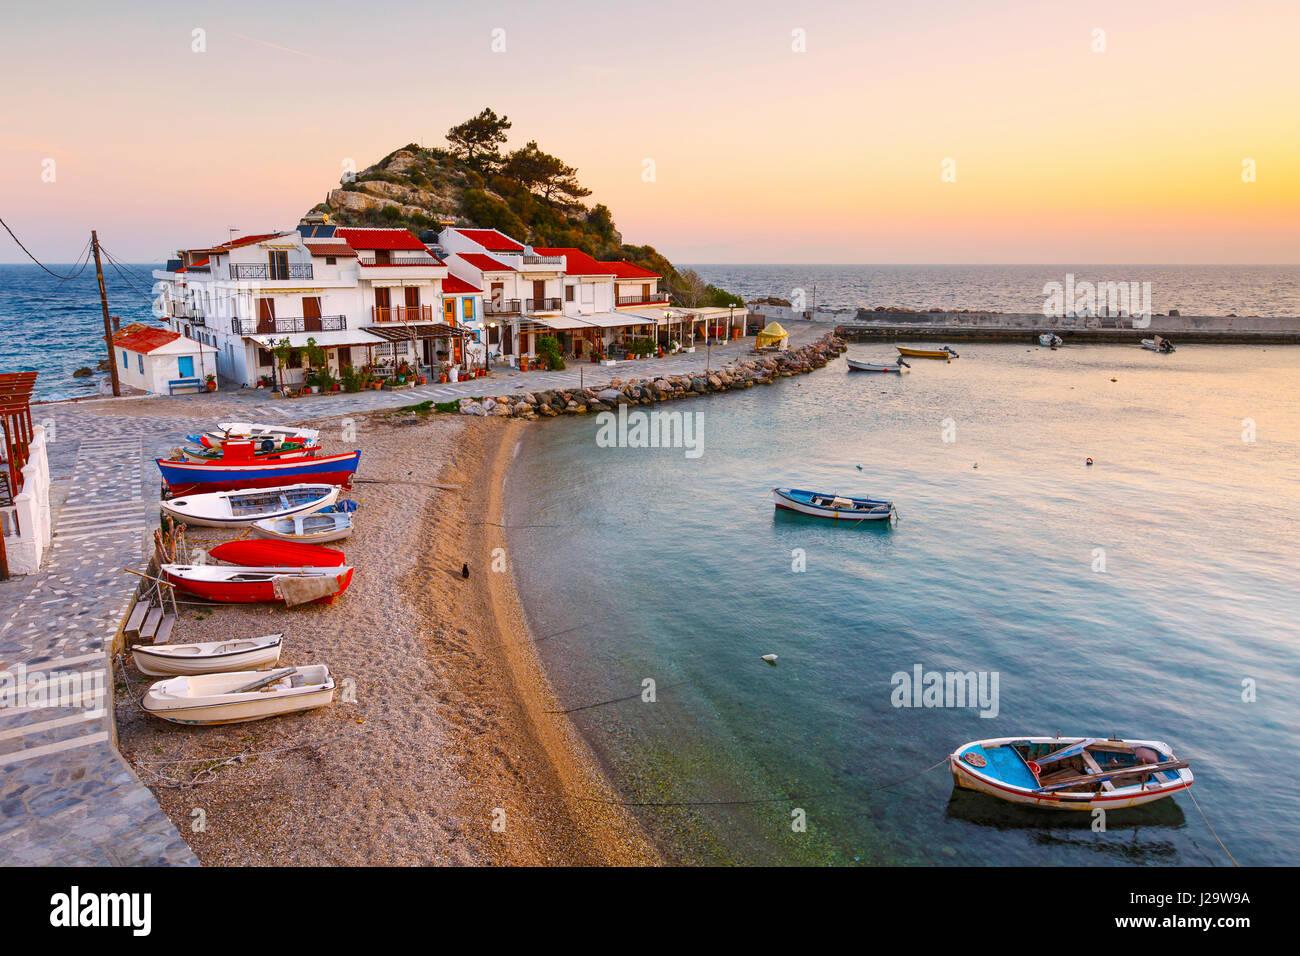 Picturesque Kokkari village on Samos island, Greece. - Stock Image